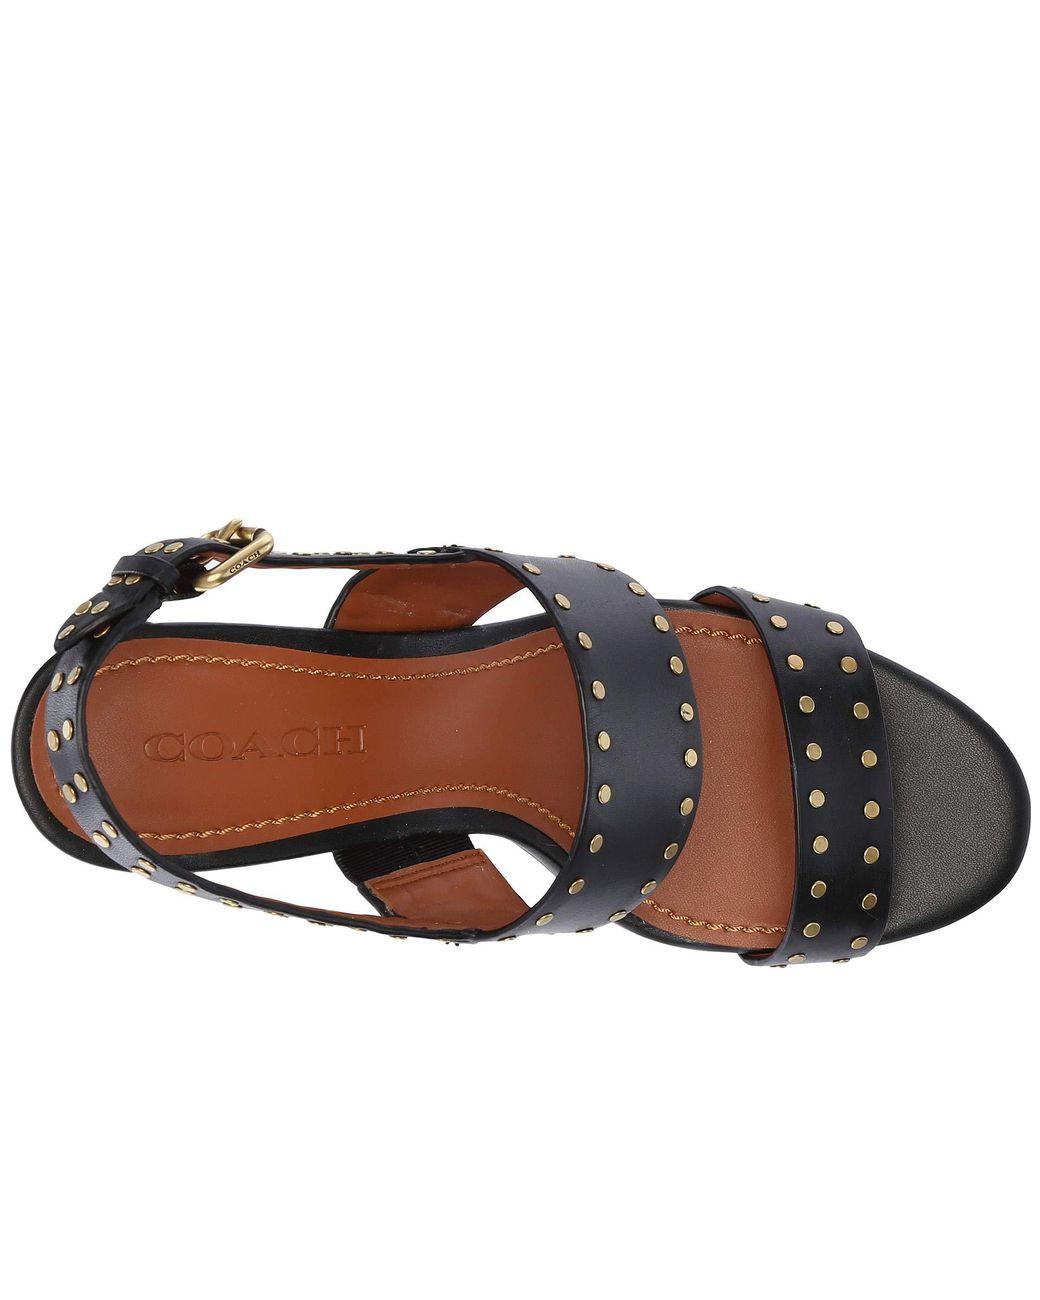 7bdc28de498 Lyst - COACH Rylie Heel Sandal (black Leather) Women s Sandals in Black -  Save 40%